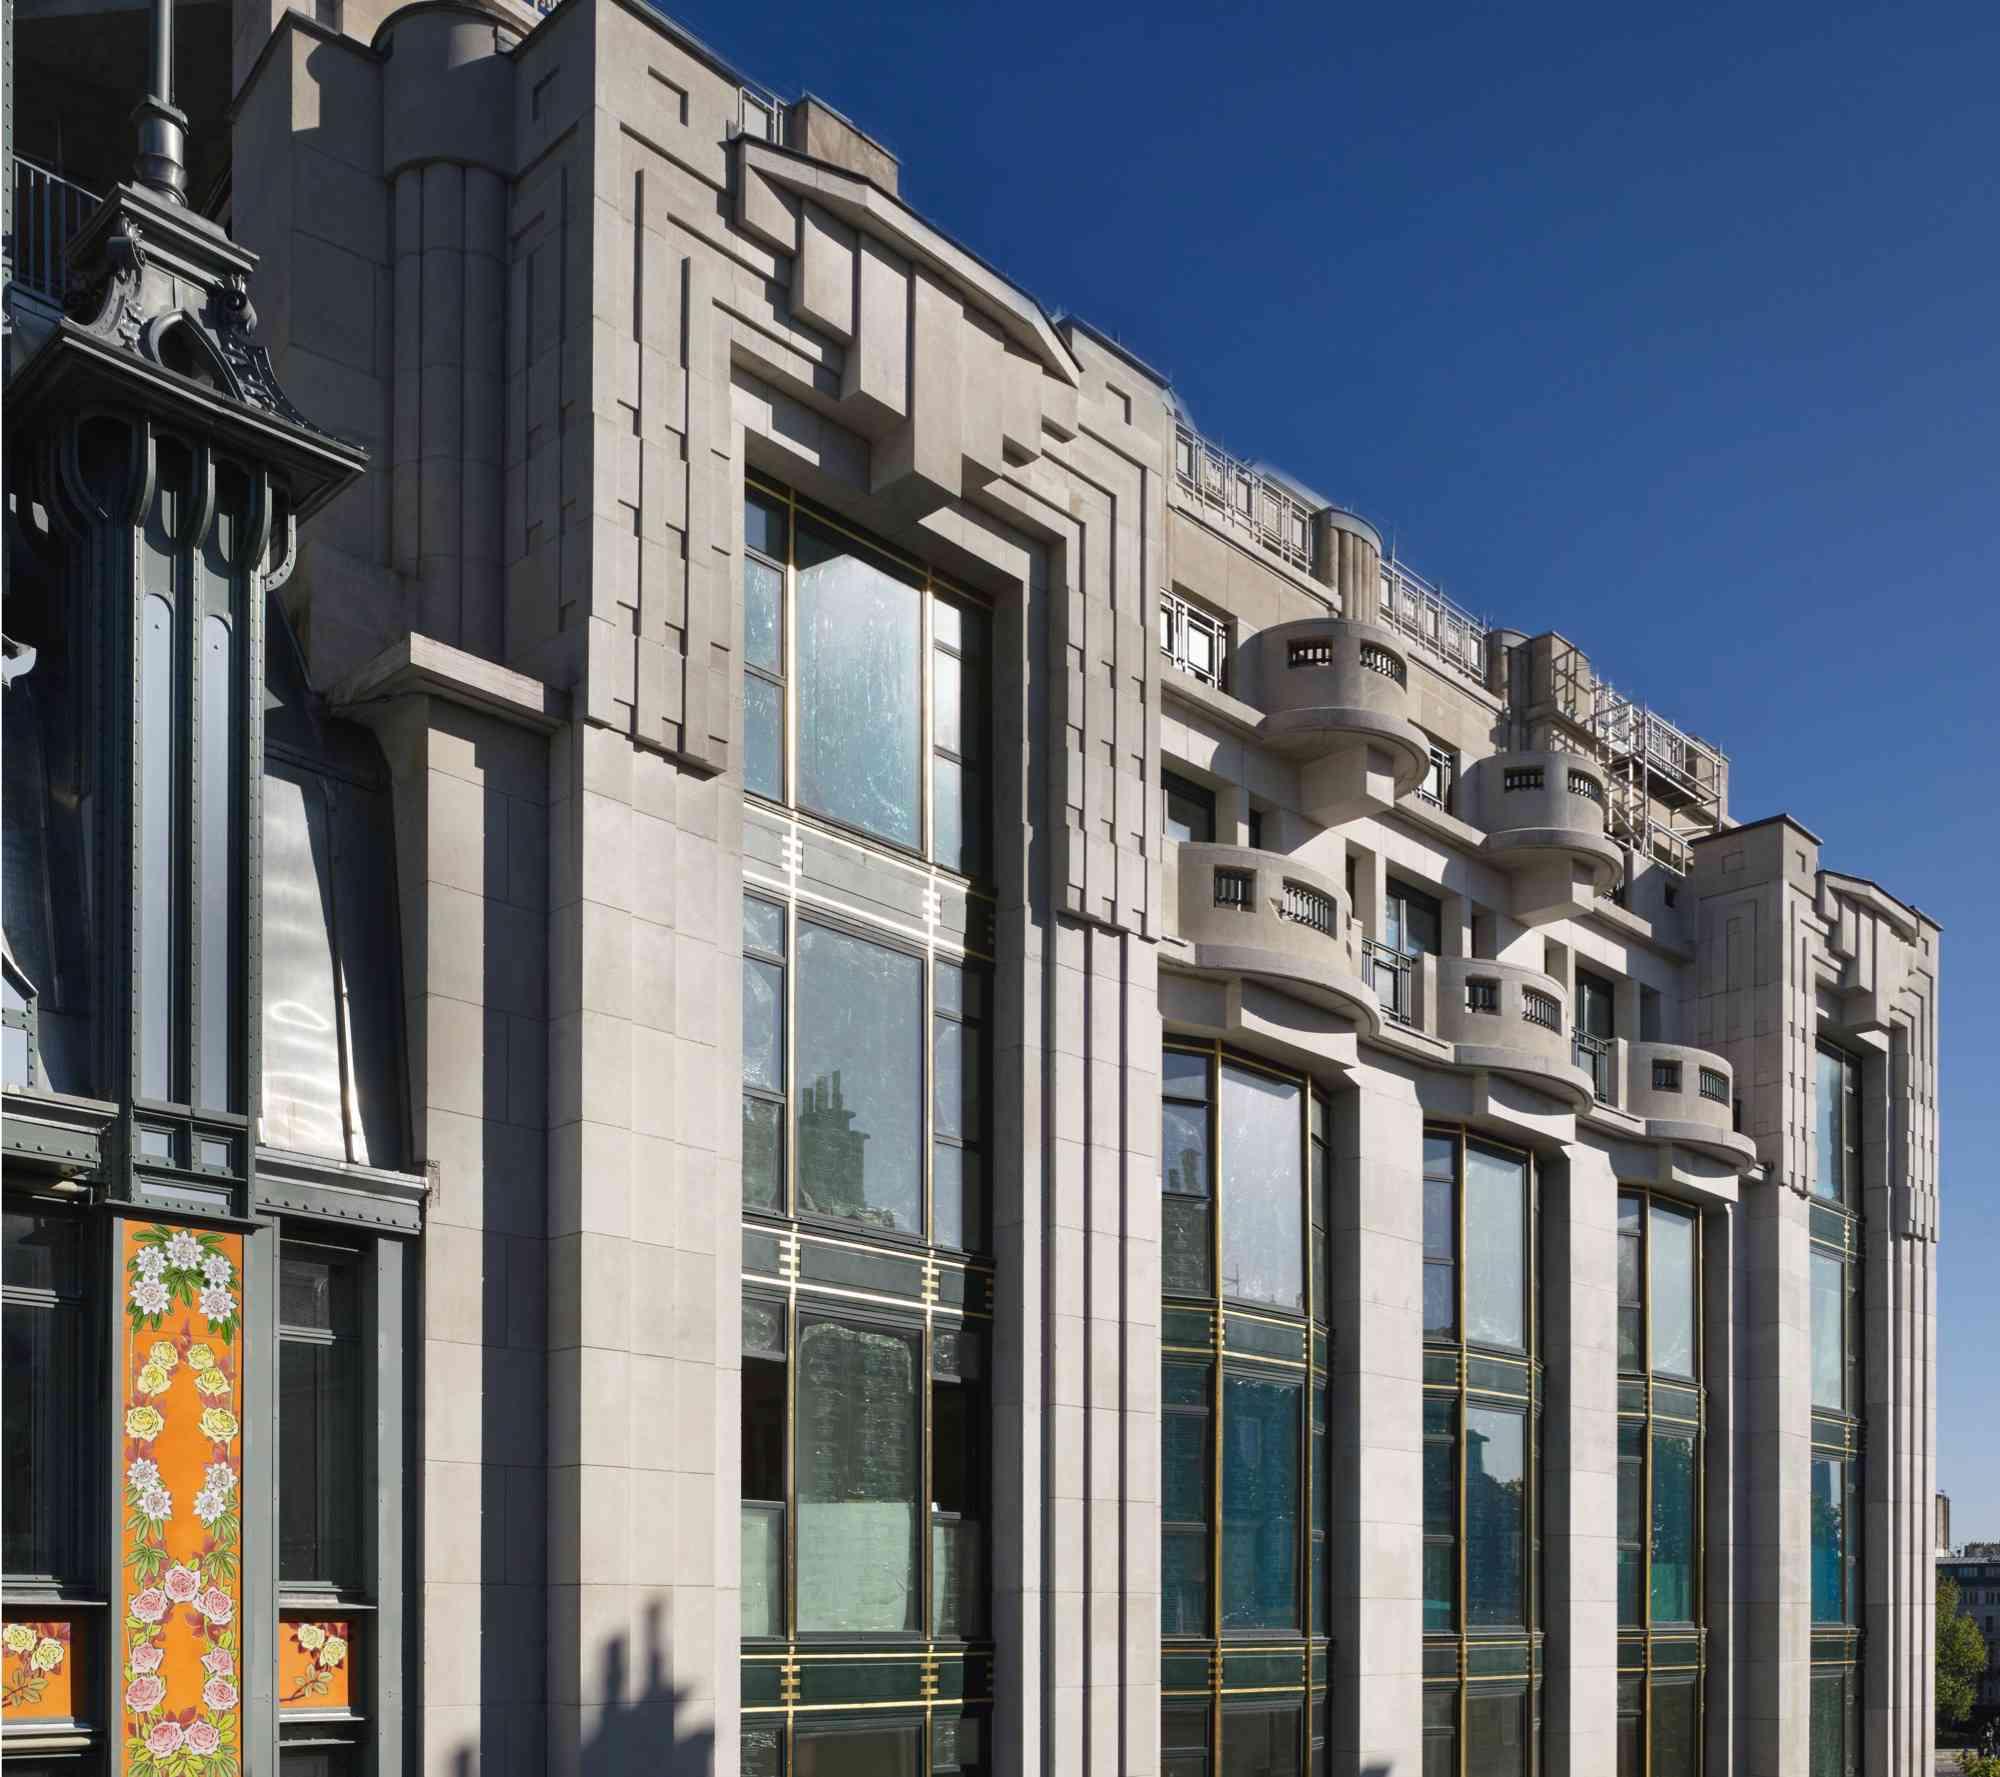 detail of top of art deco building